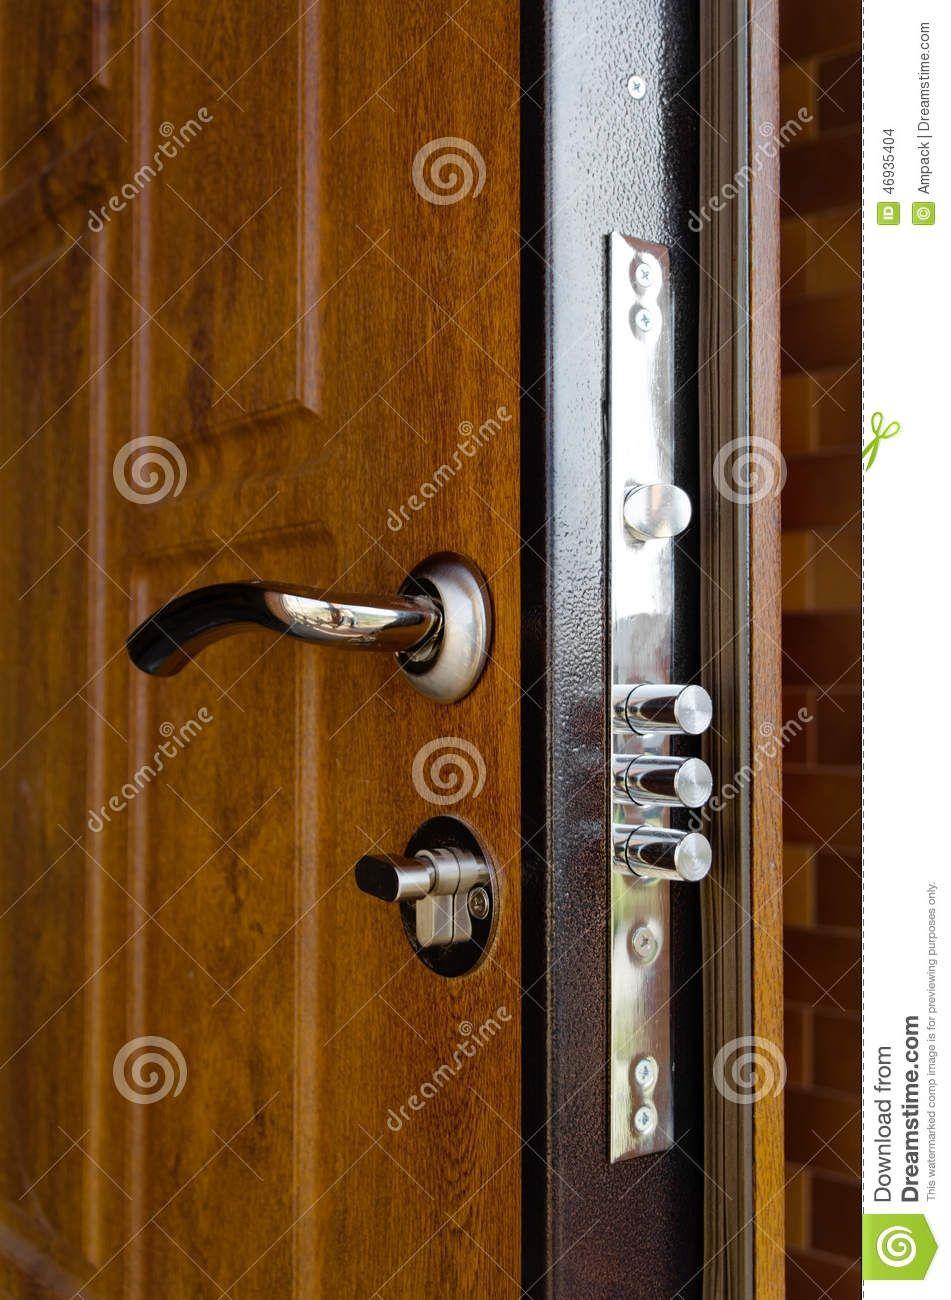 High Security Wooden Front Door Httpfranzdondi Pinterest